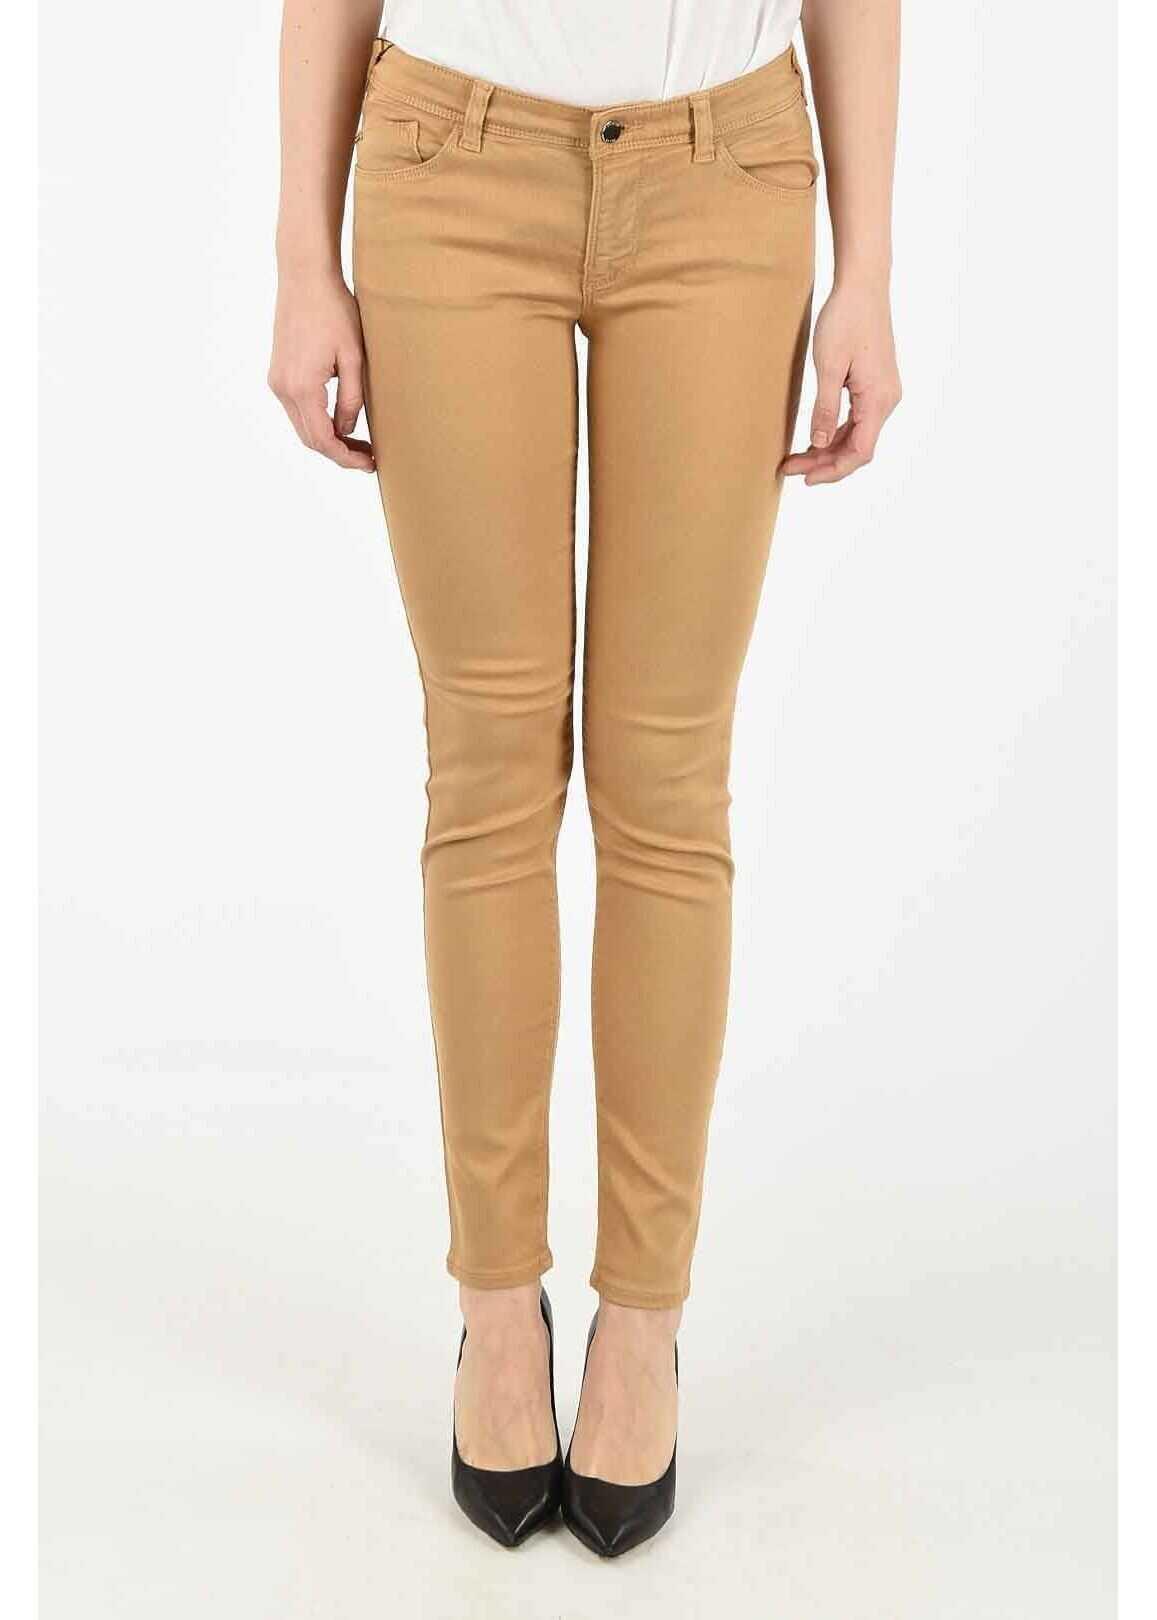 Armani ARMANI JEANS Skinny Fit ORCHID Jeans BROWN